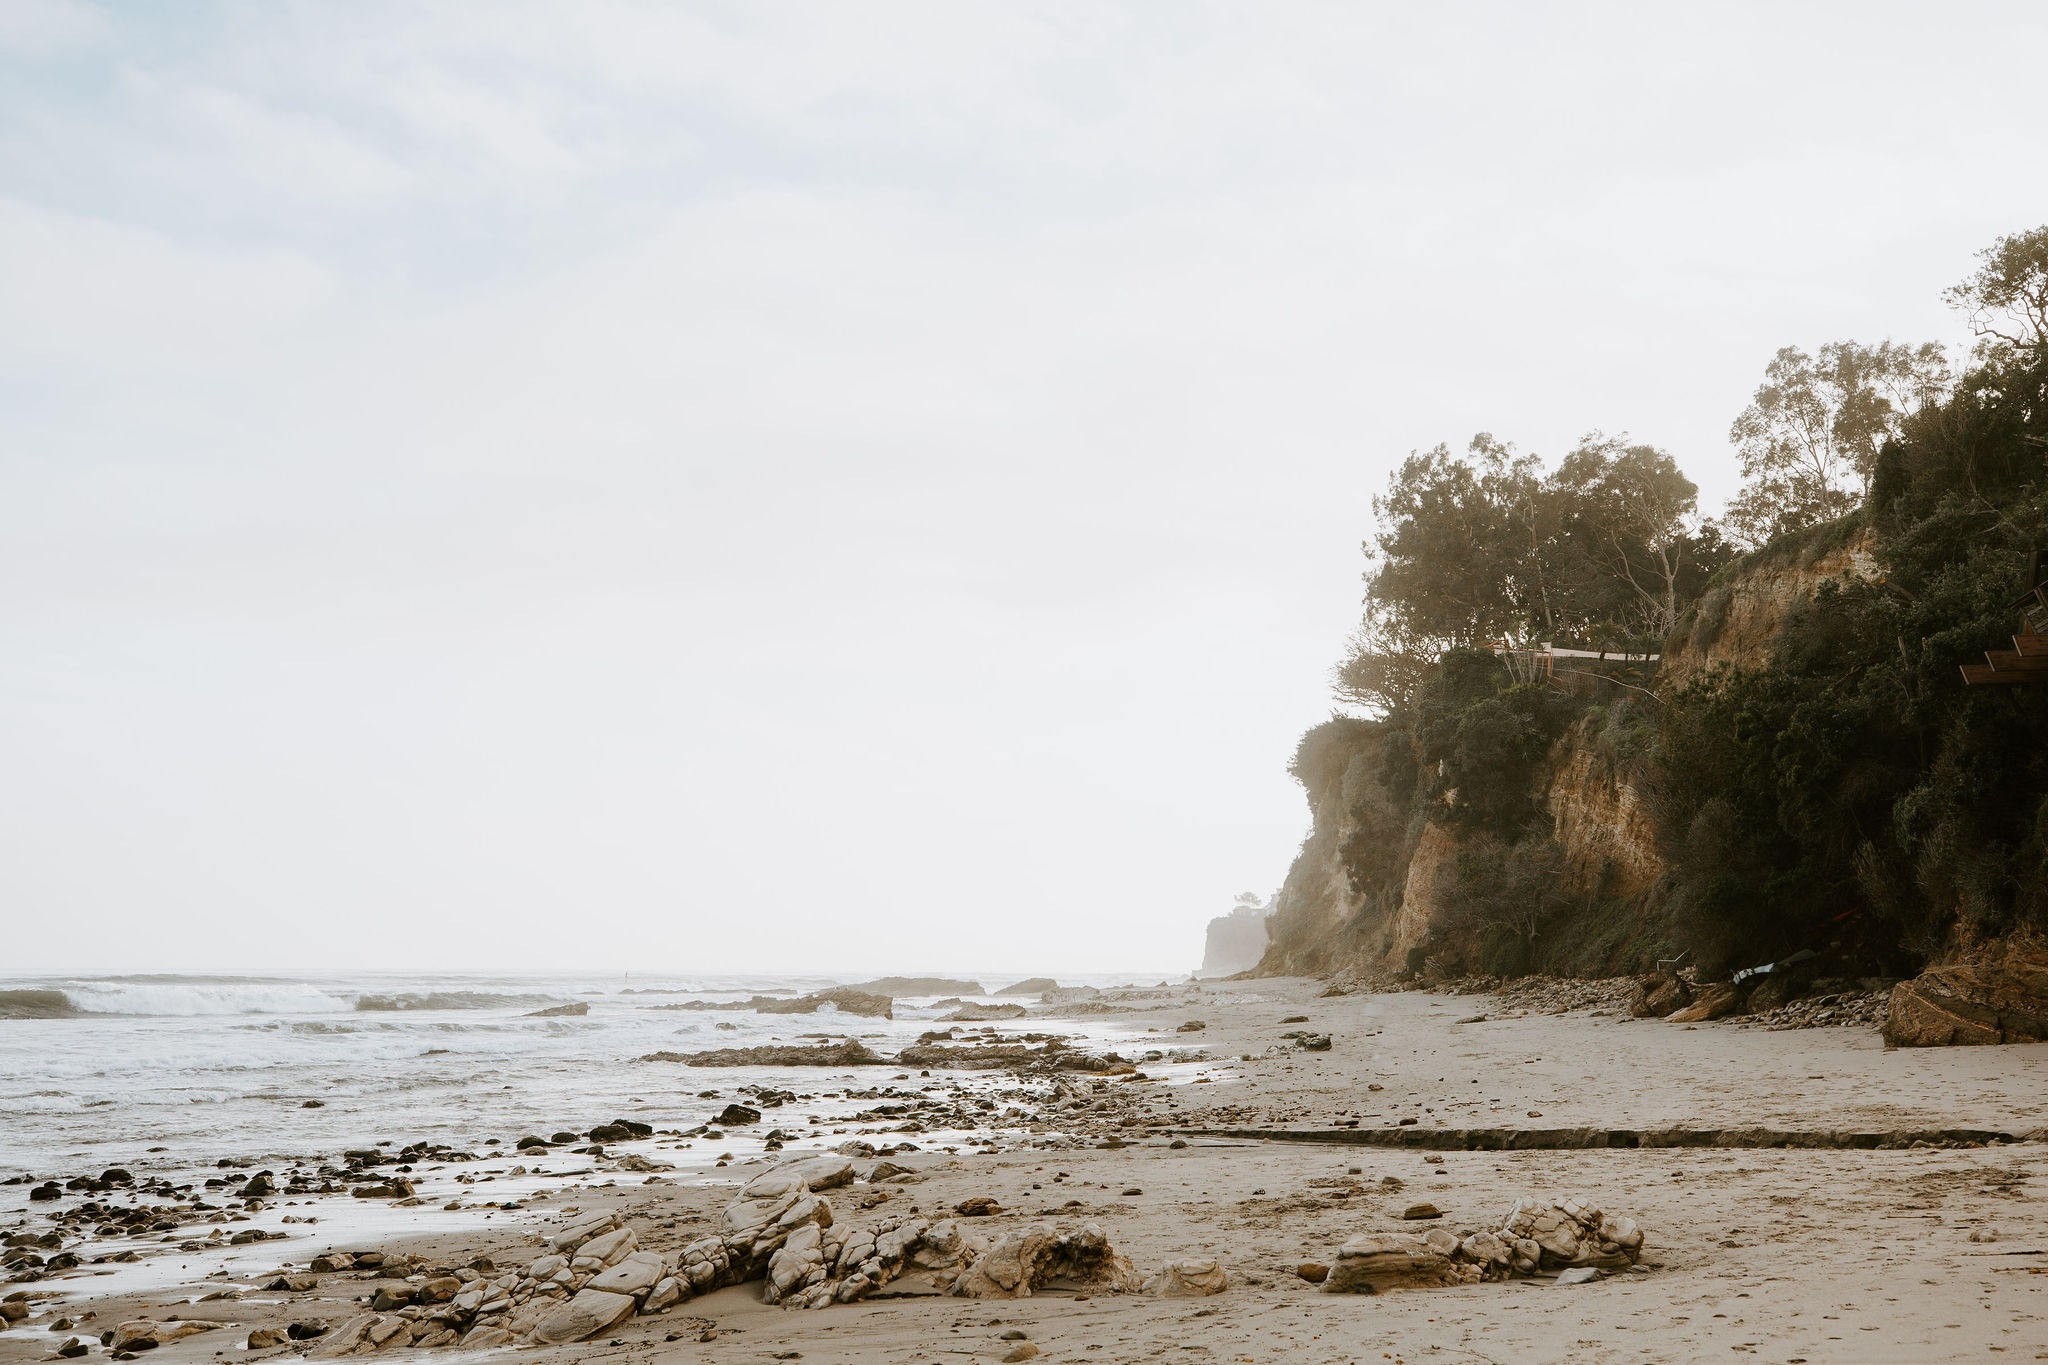 LittleDumeEngagementSession_Geoff&LyndsiPhotography_Savannah&Jordan61.jpg